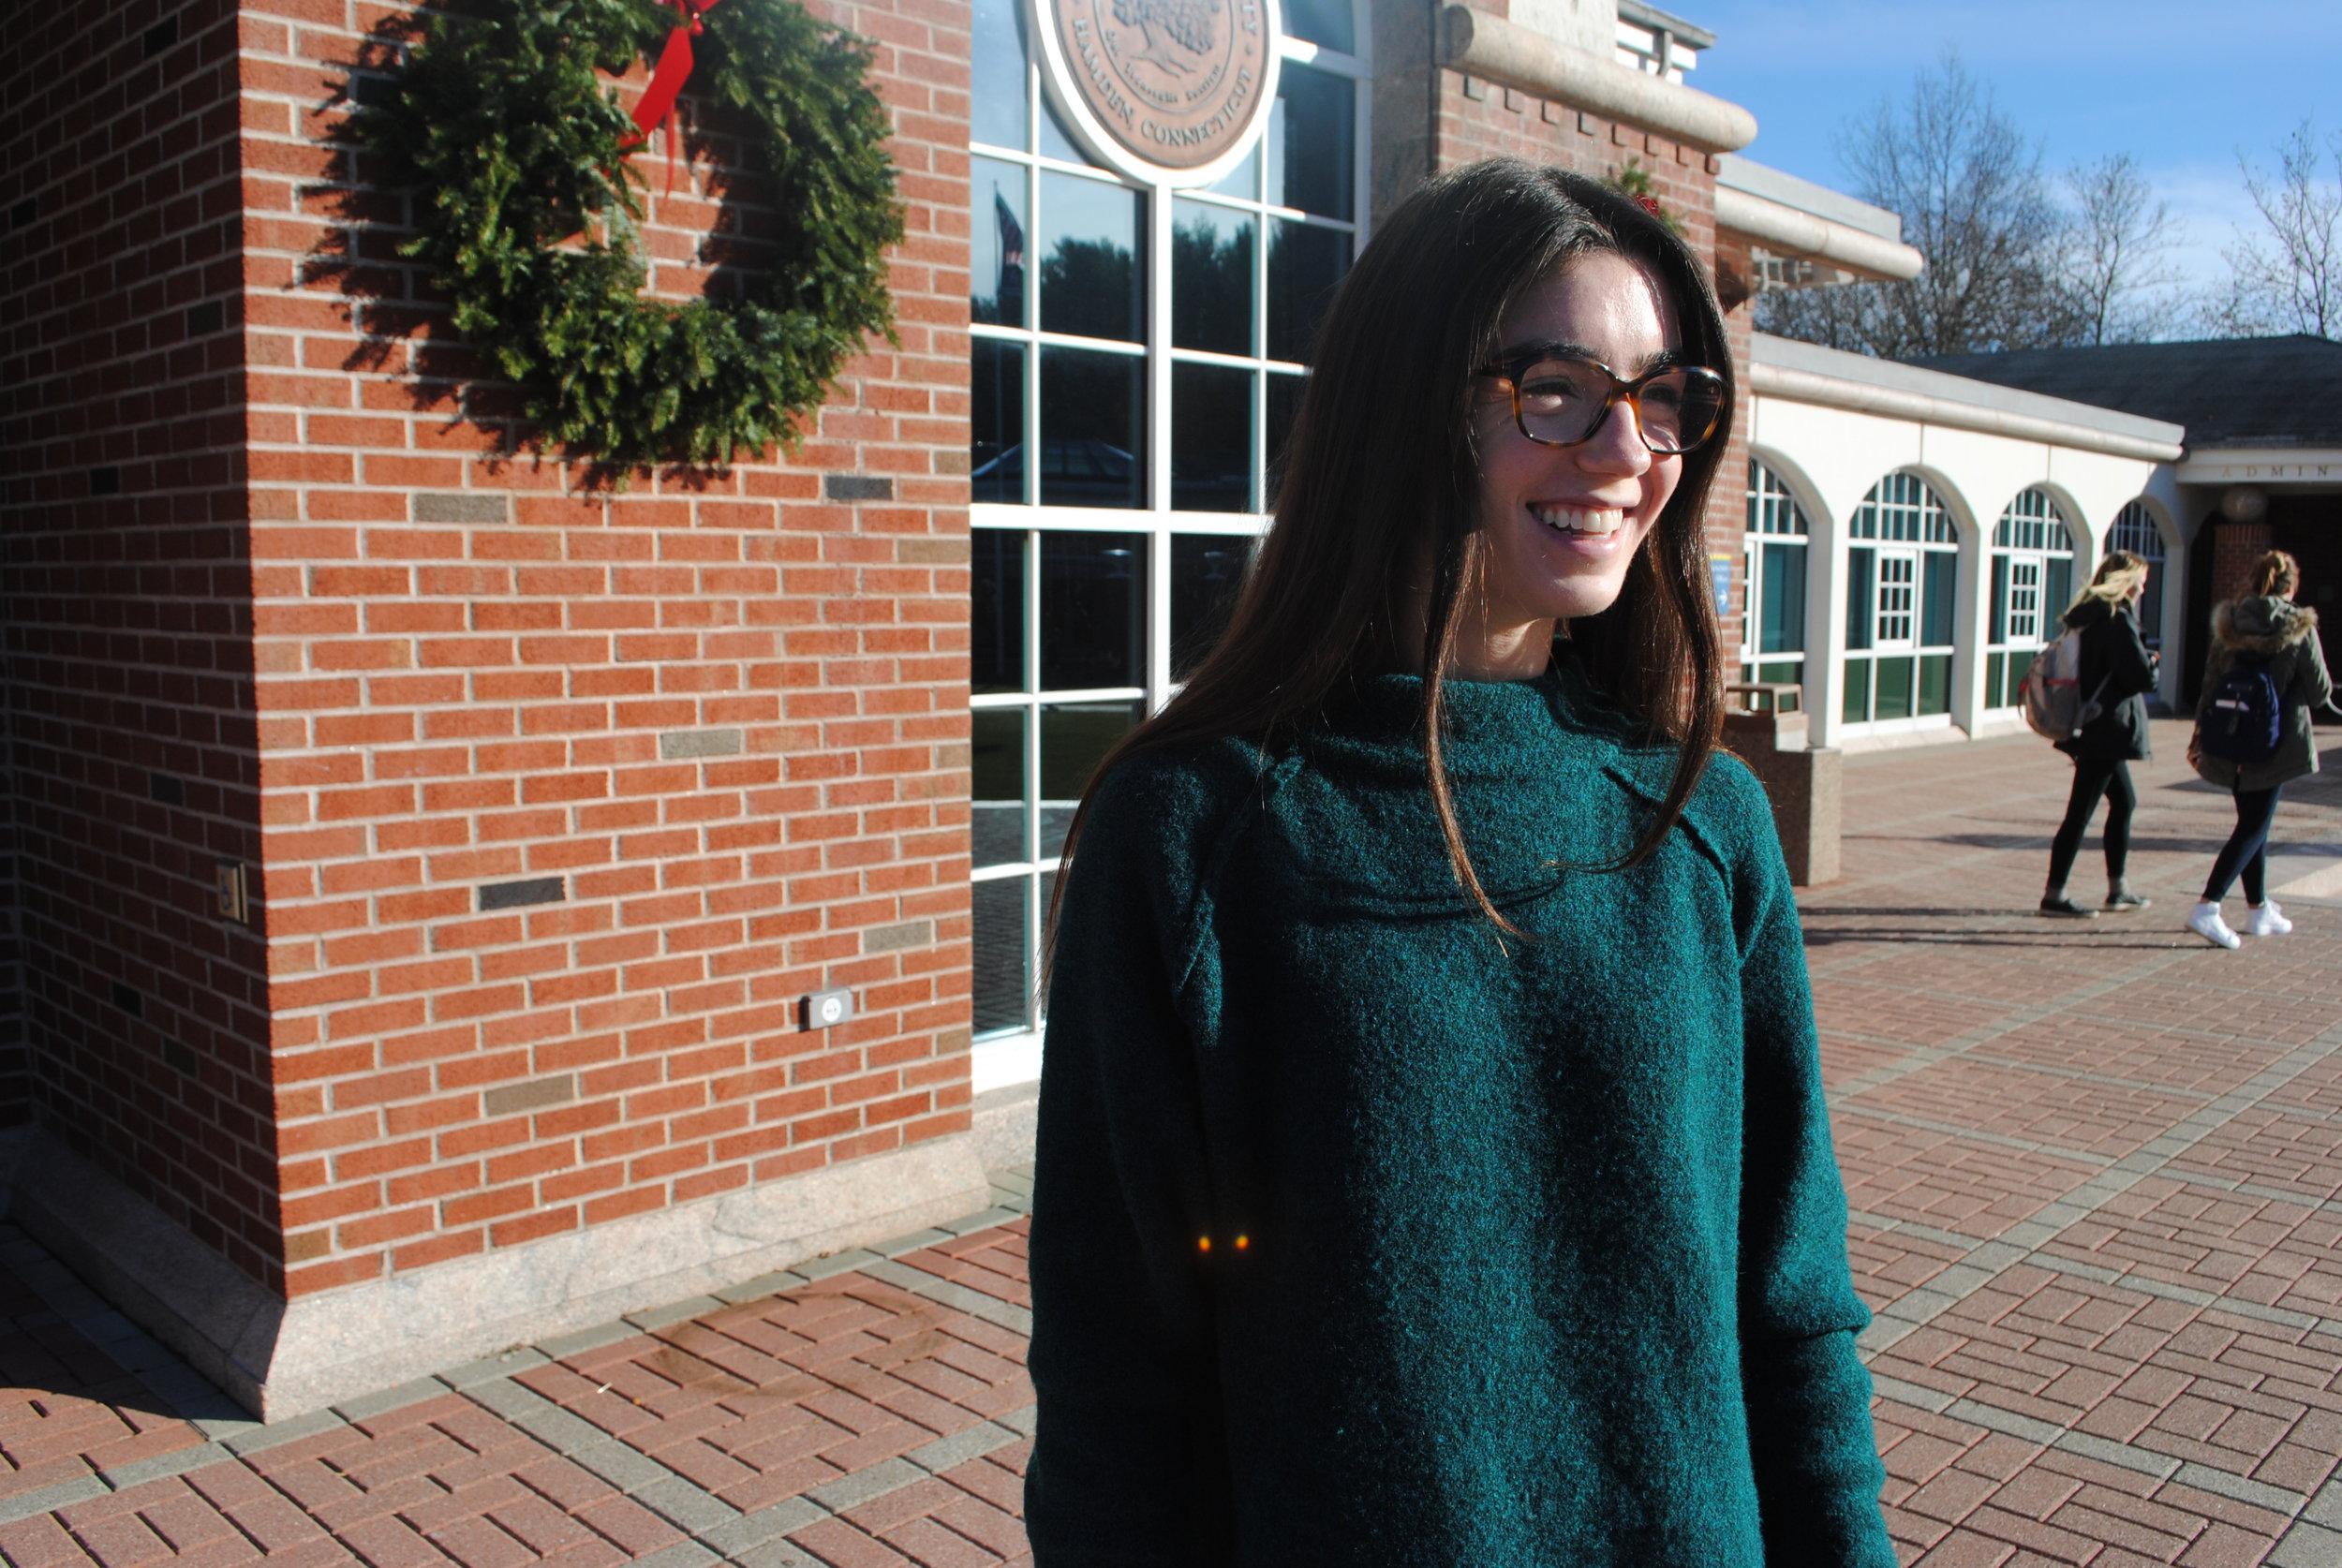 Senior health science major Danielle Rattotti outside of the library.